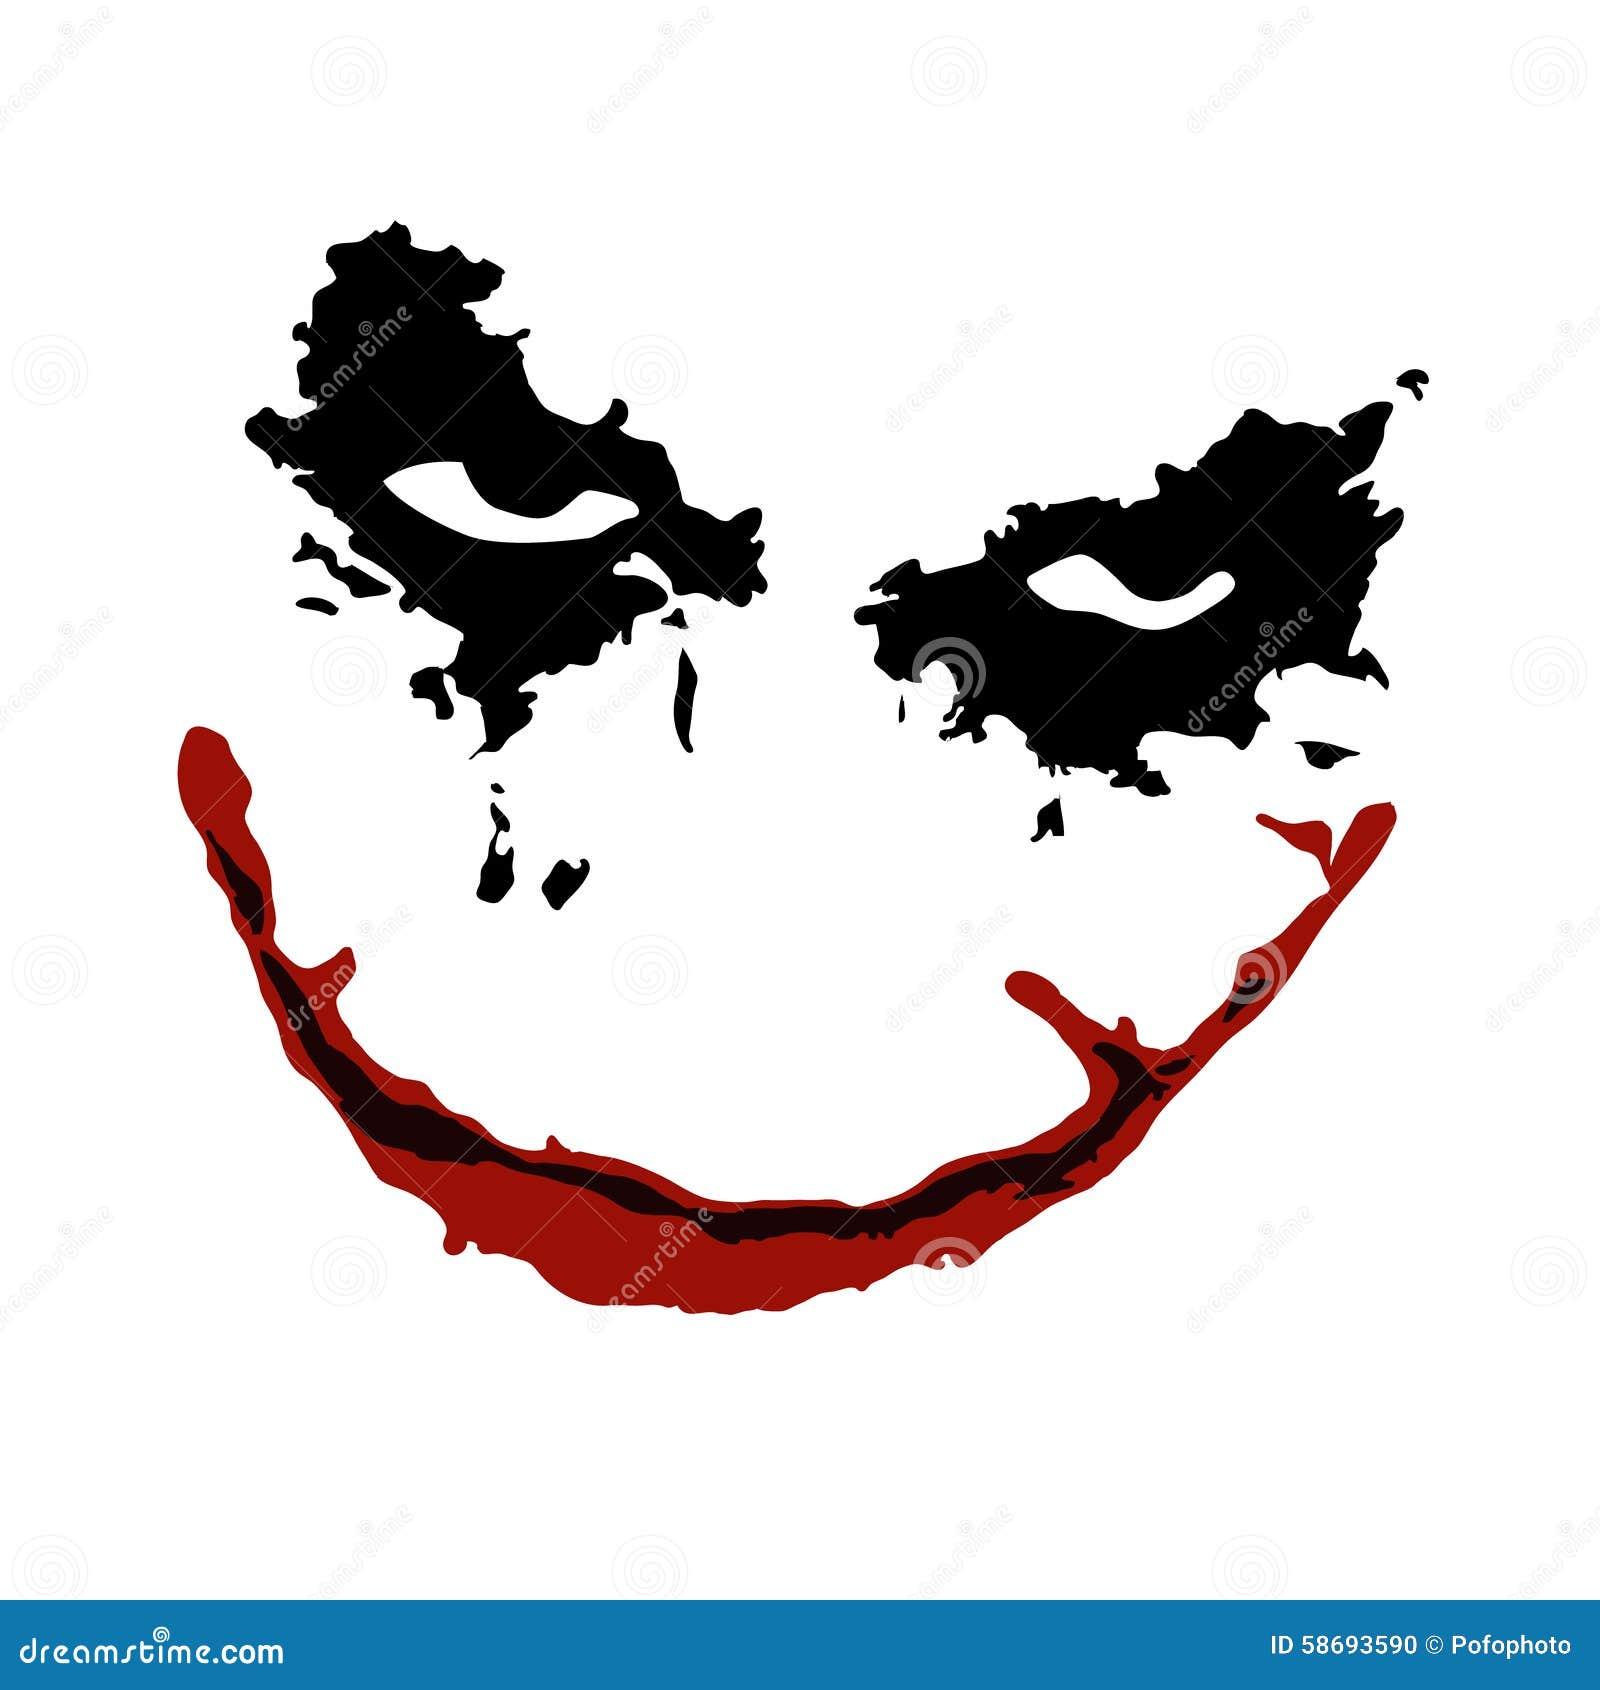 Joker Batman Movie Isolated White Background Easy Tattoo Image Download